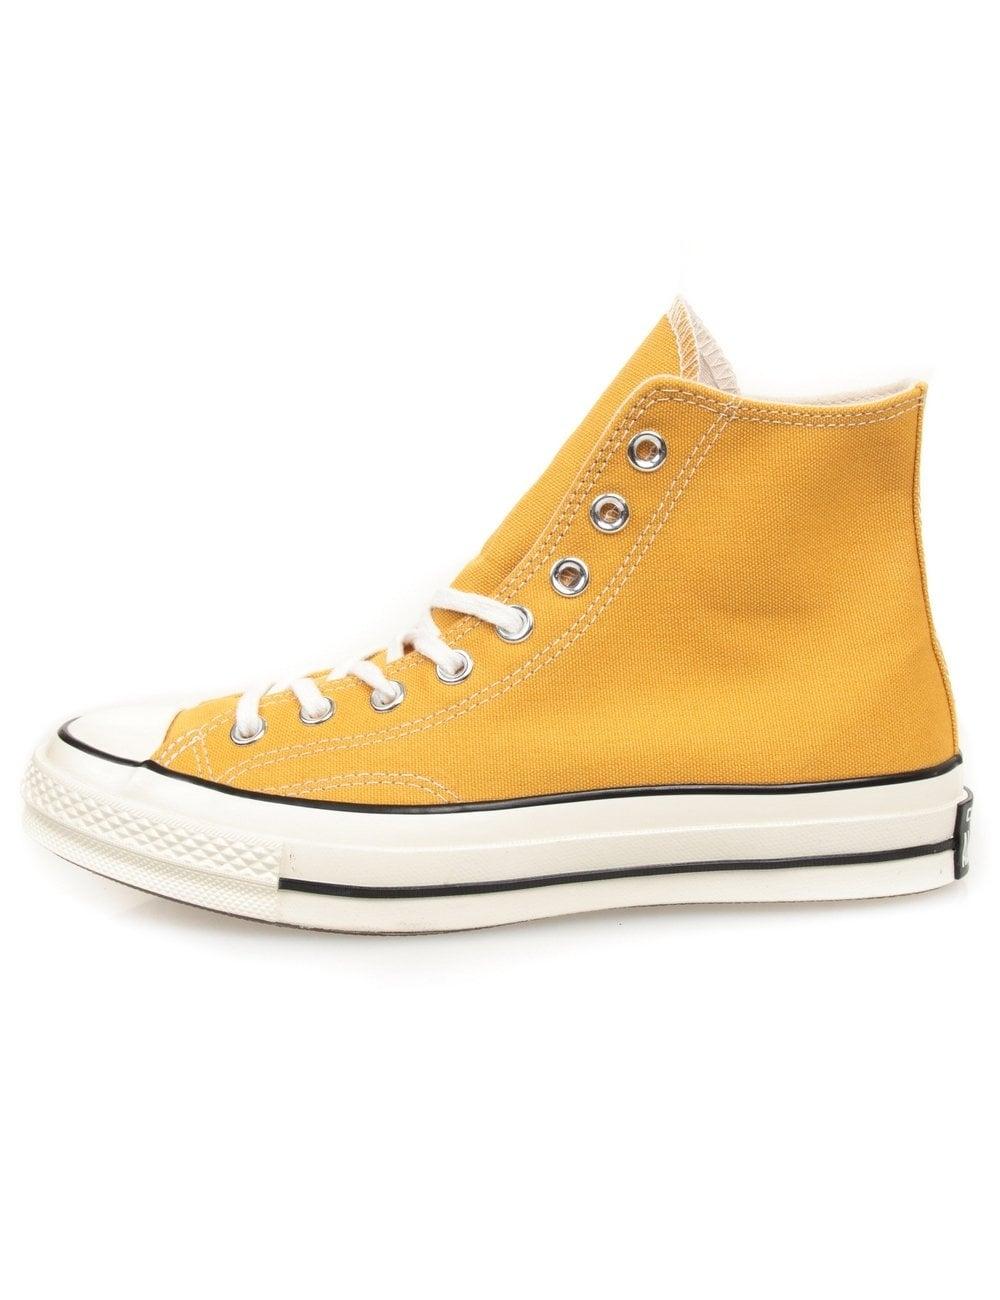 Converse Chuck Taylor 70s Hi Boots - Sunflower - Footwear from Fat ... 63f127aa5